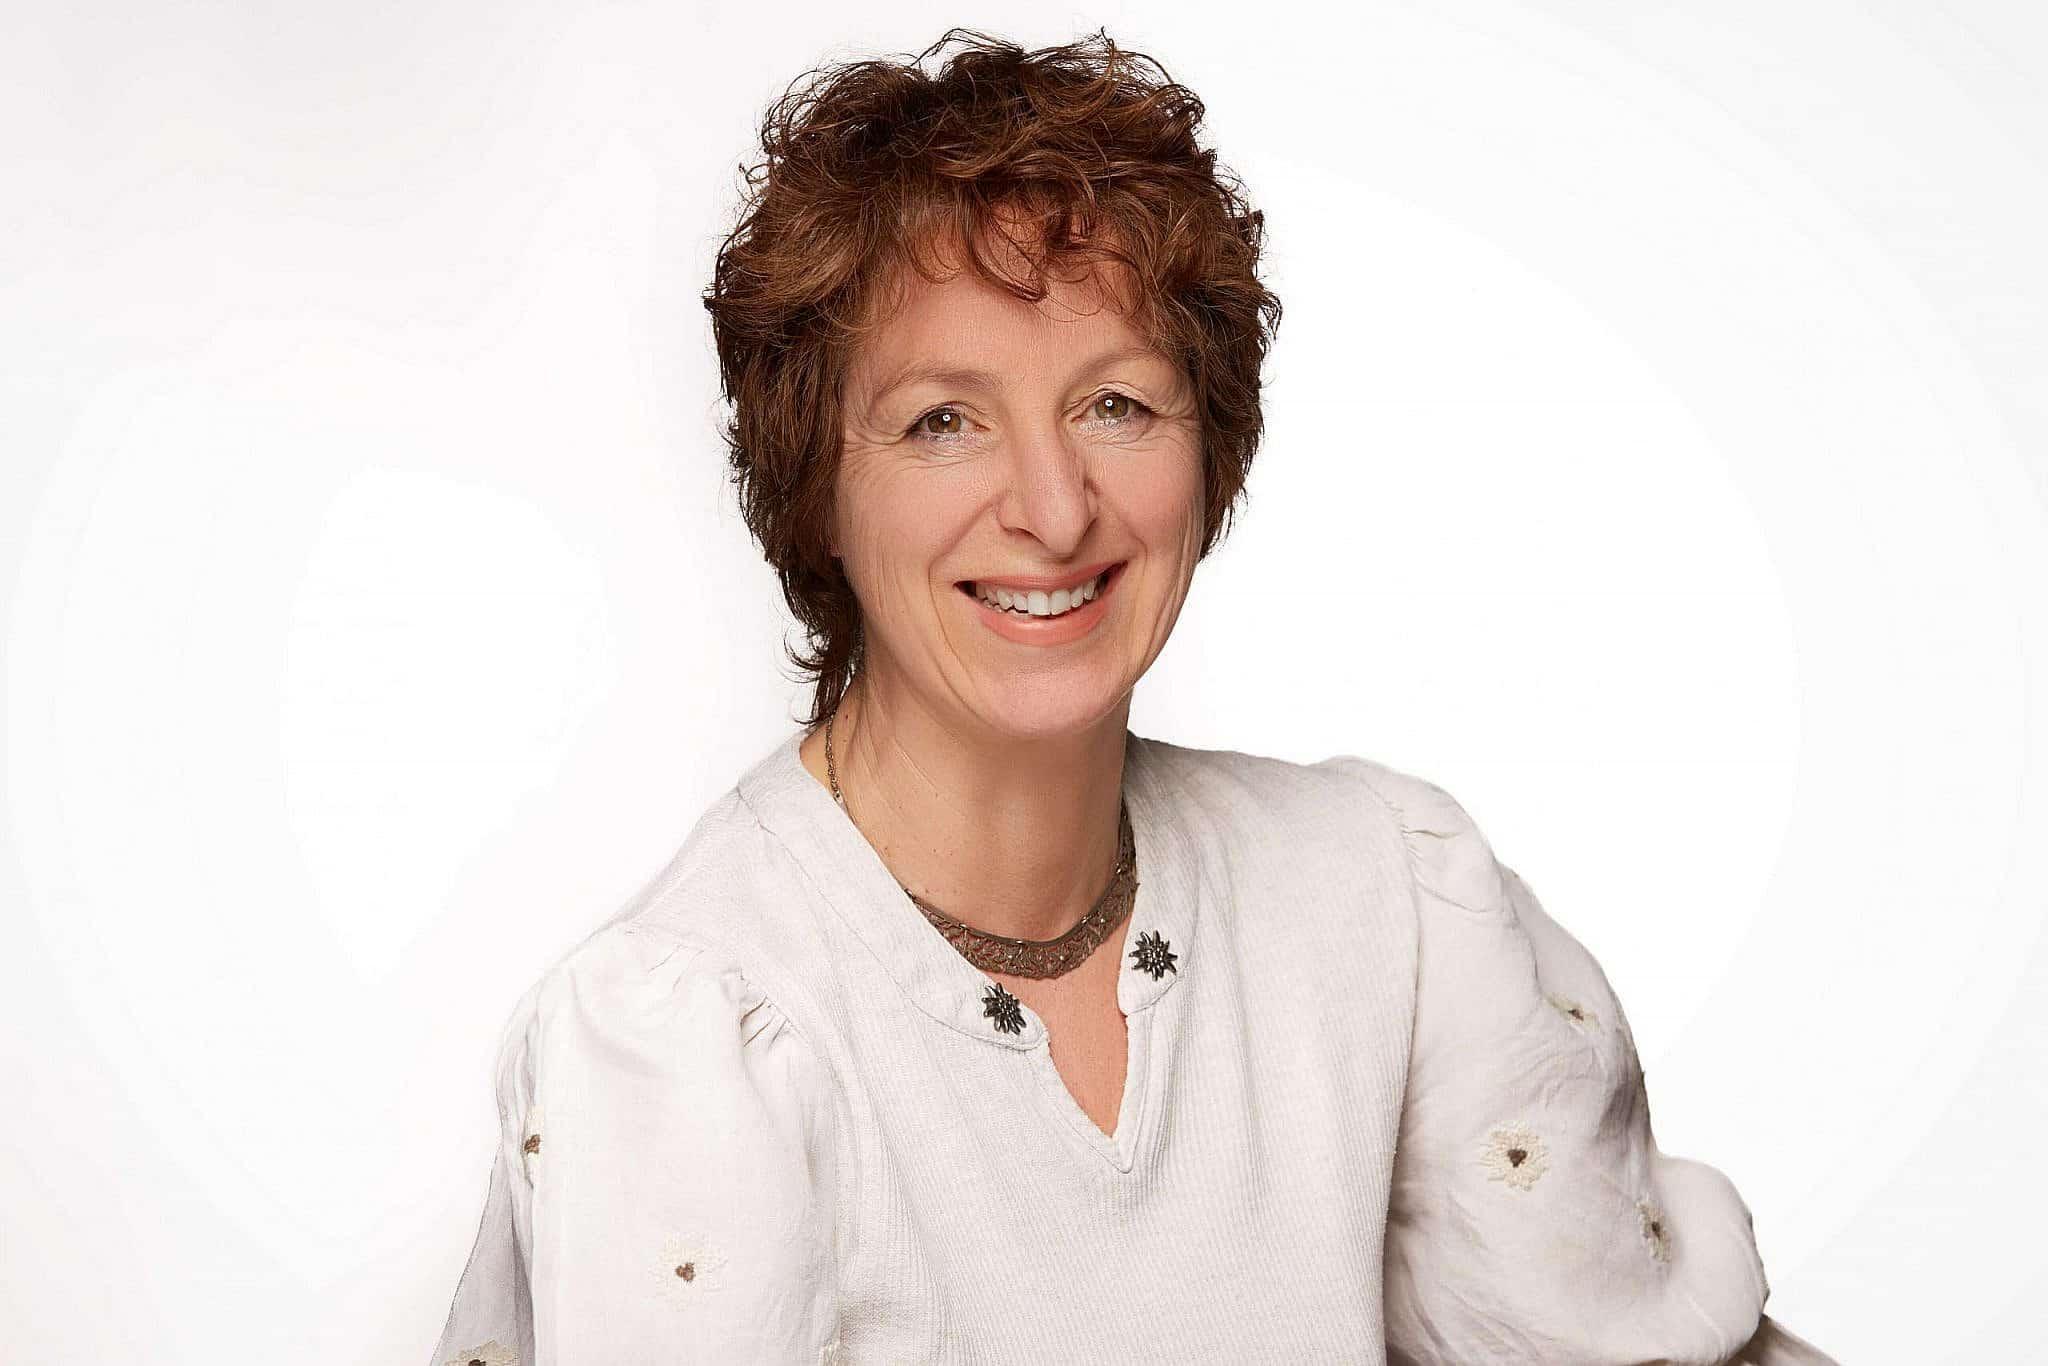 Julia Mayr